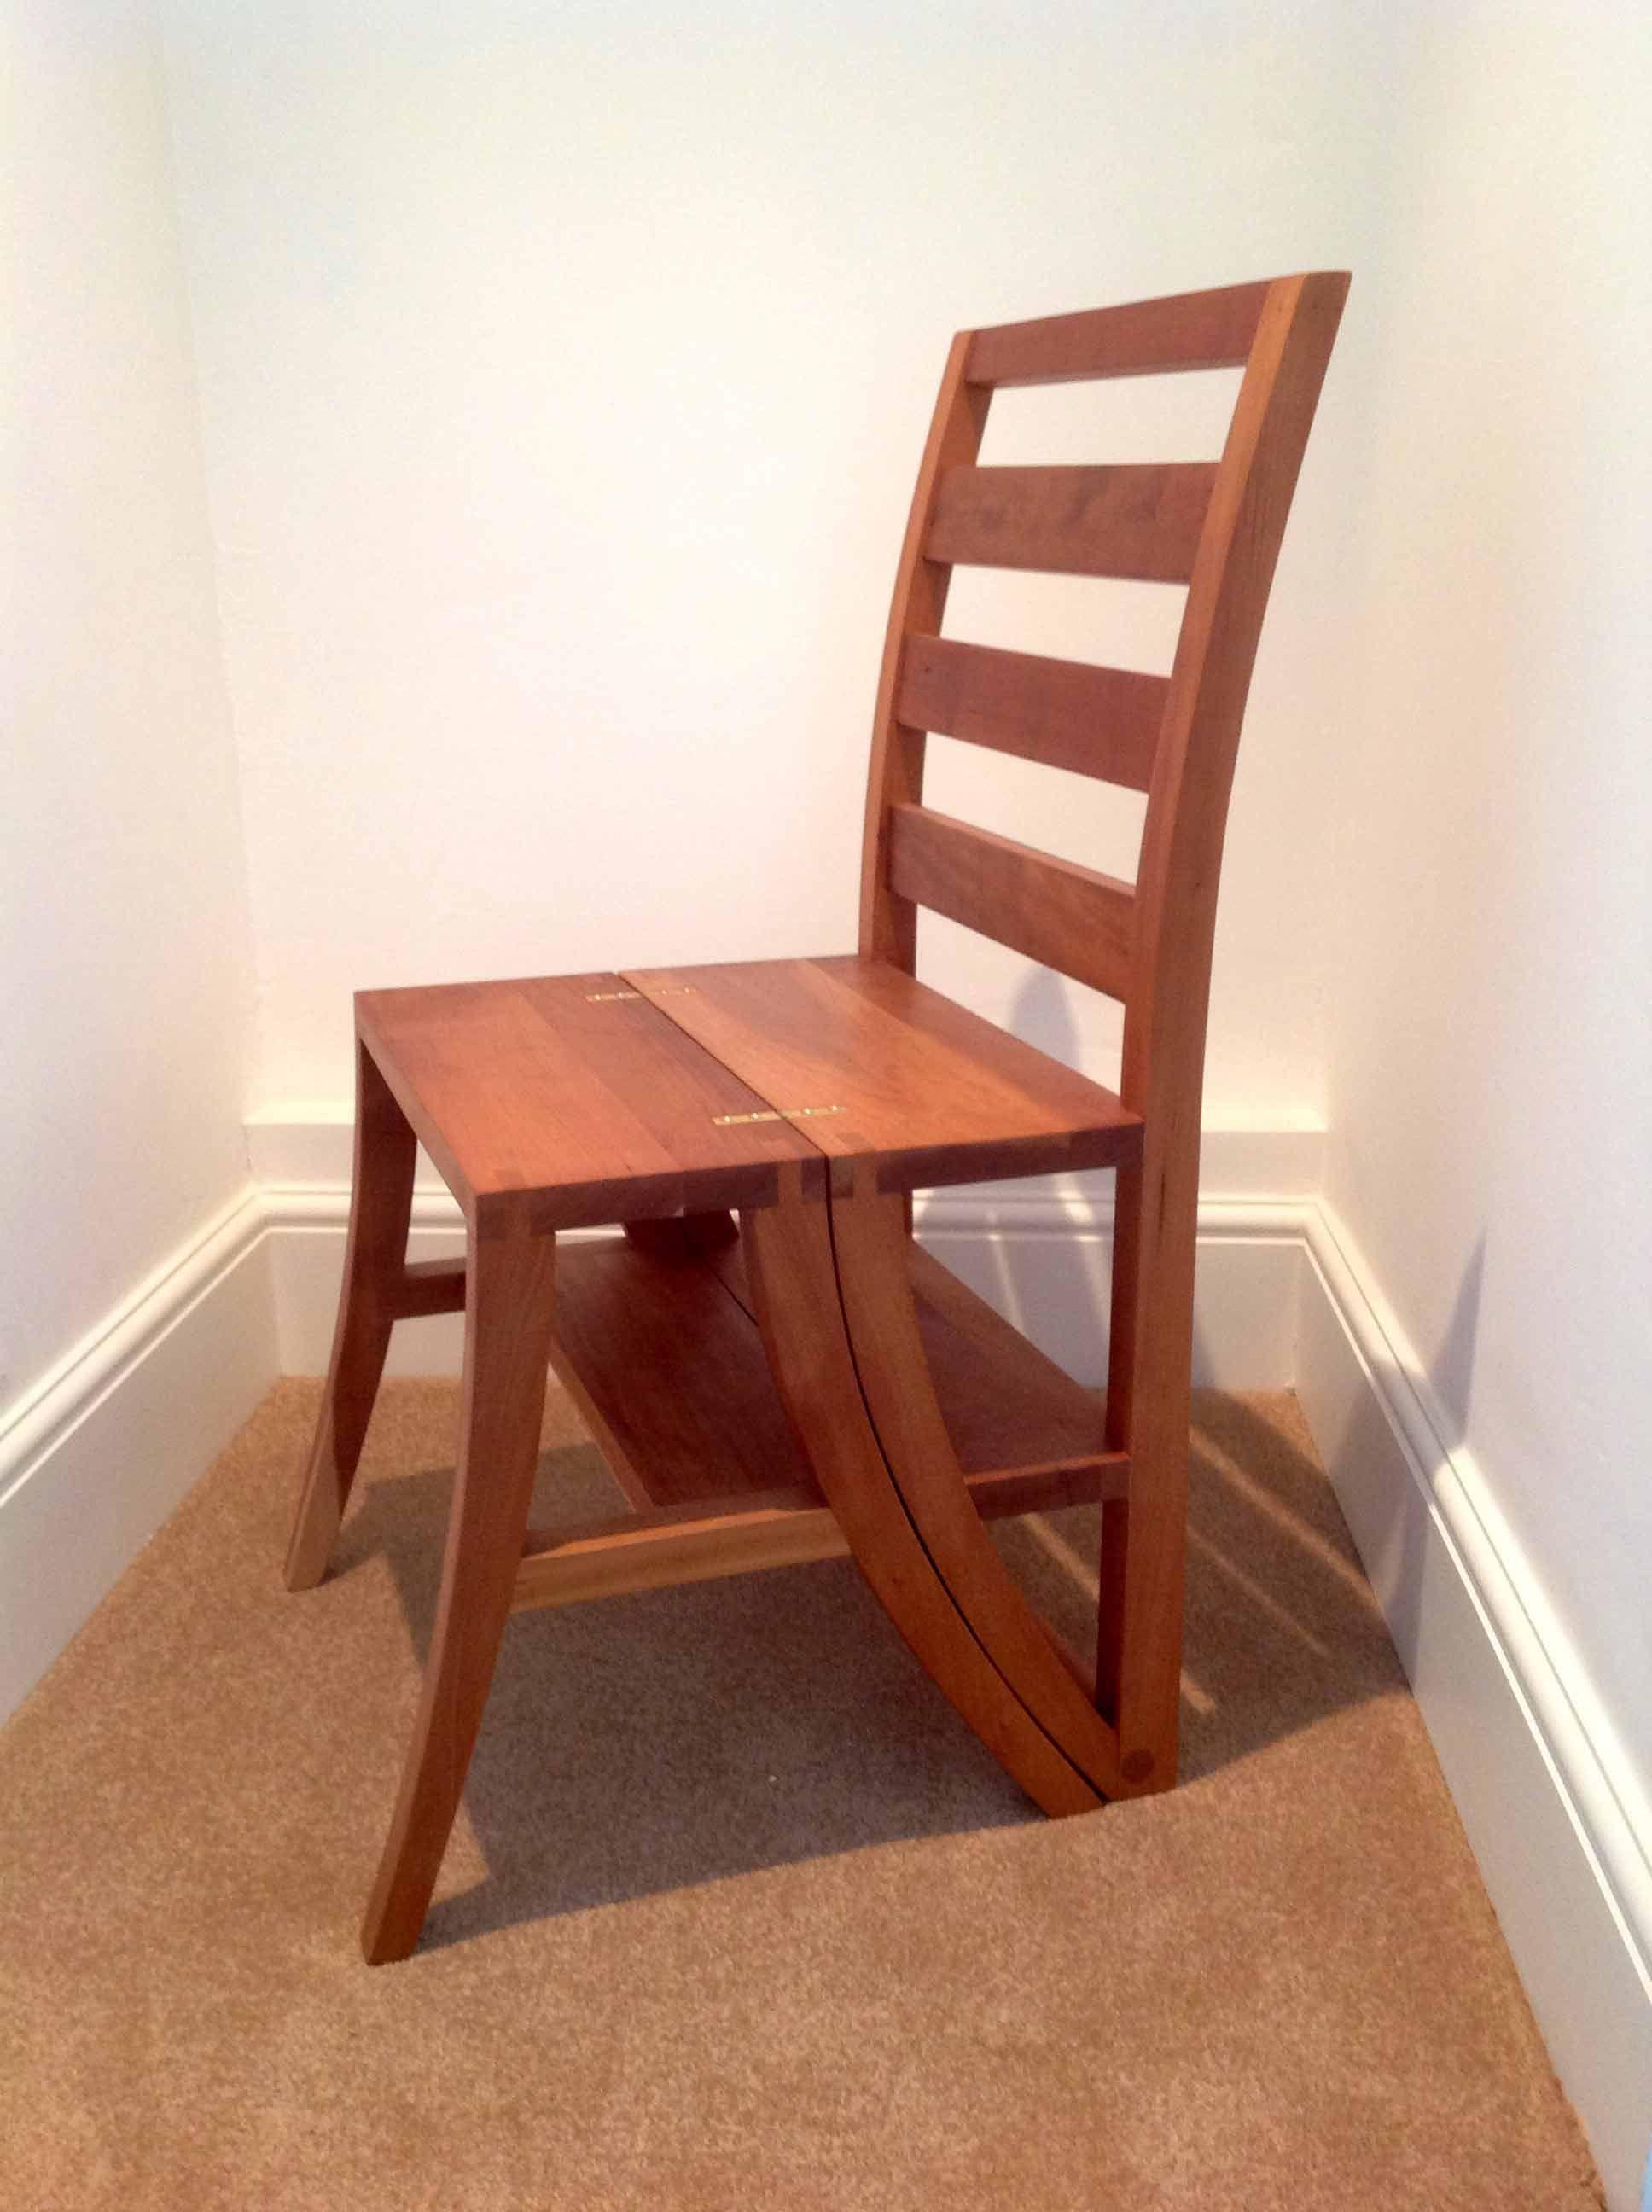 Delightful Handmade, Bespoke Furniture By Lee Sinclair Furniture Http://leesinclair.co.